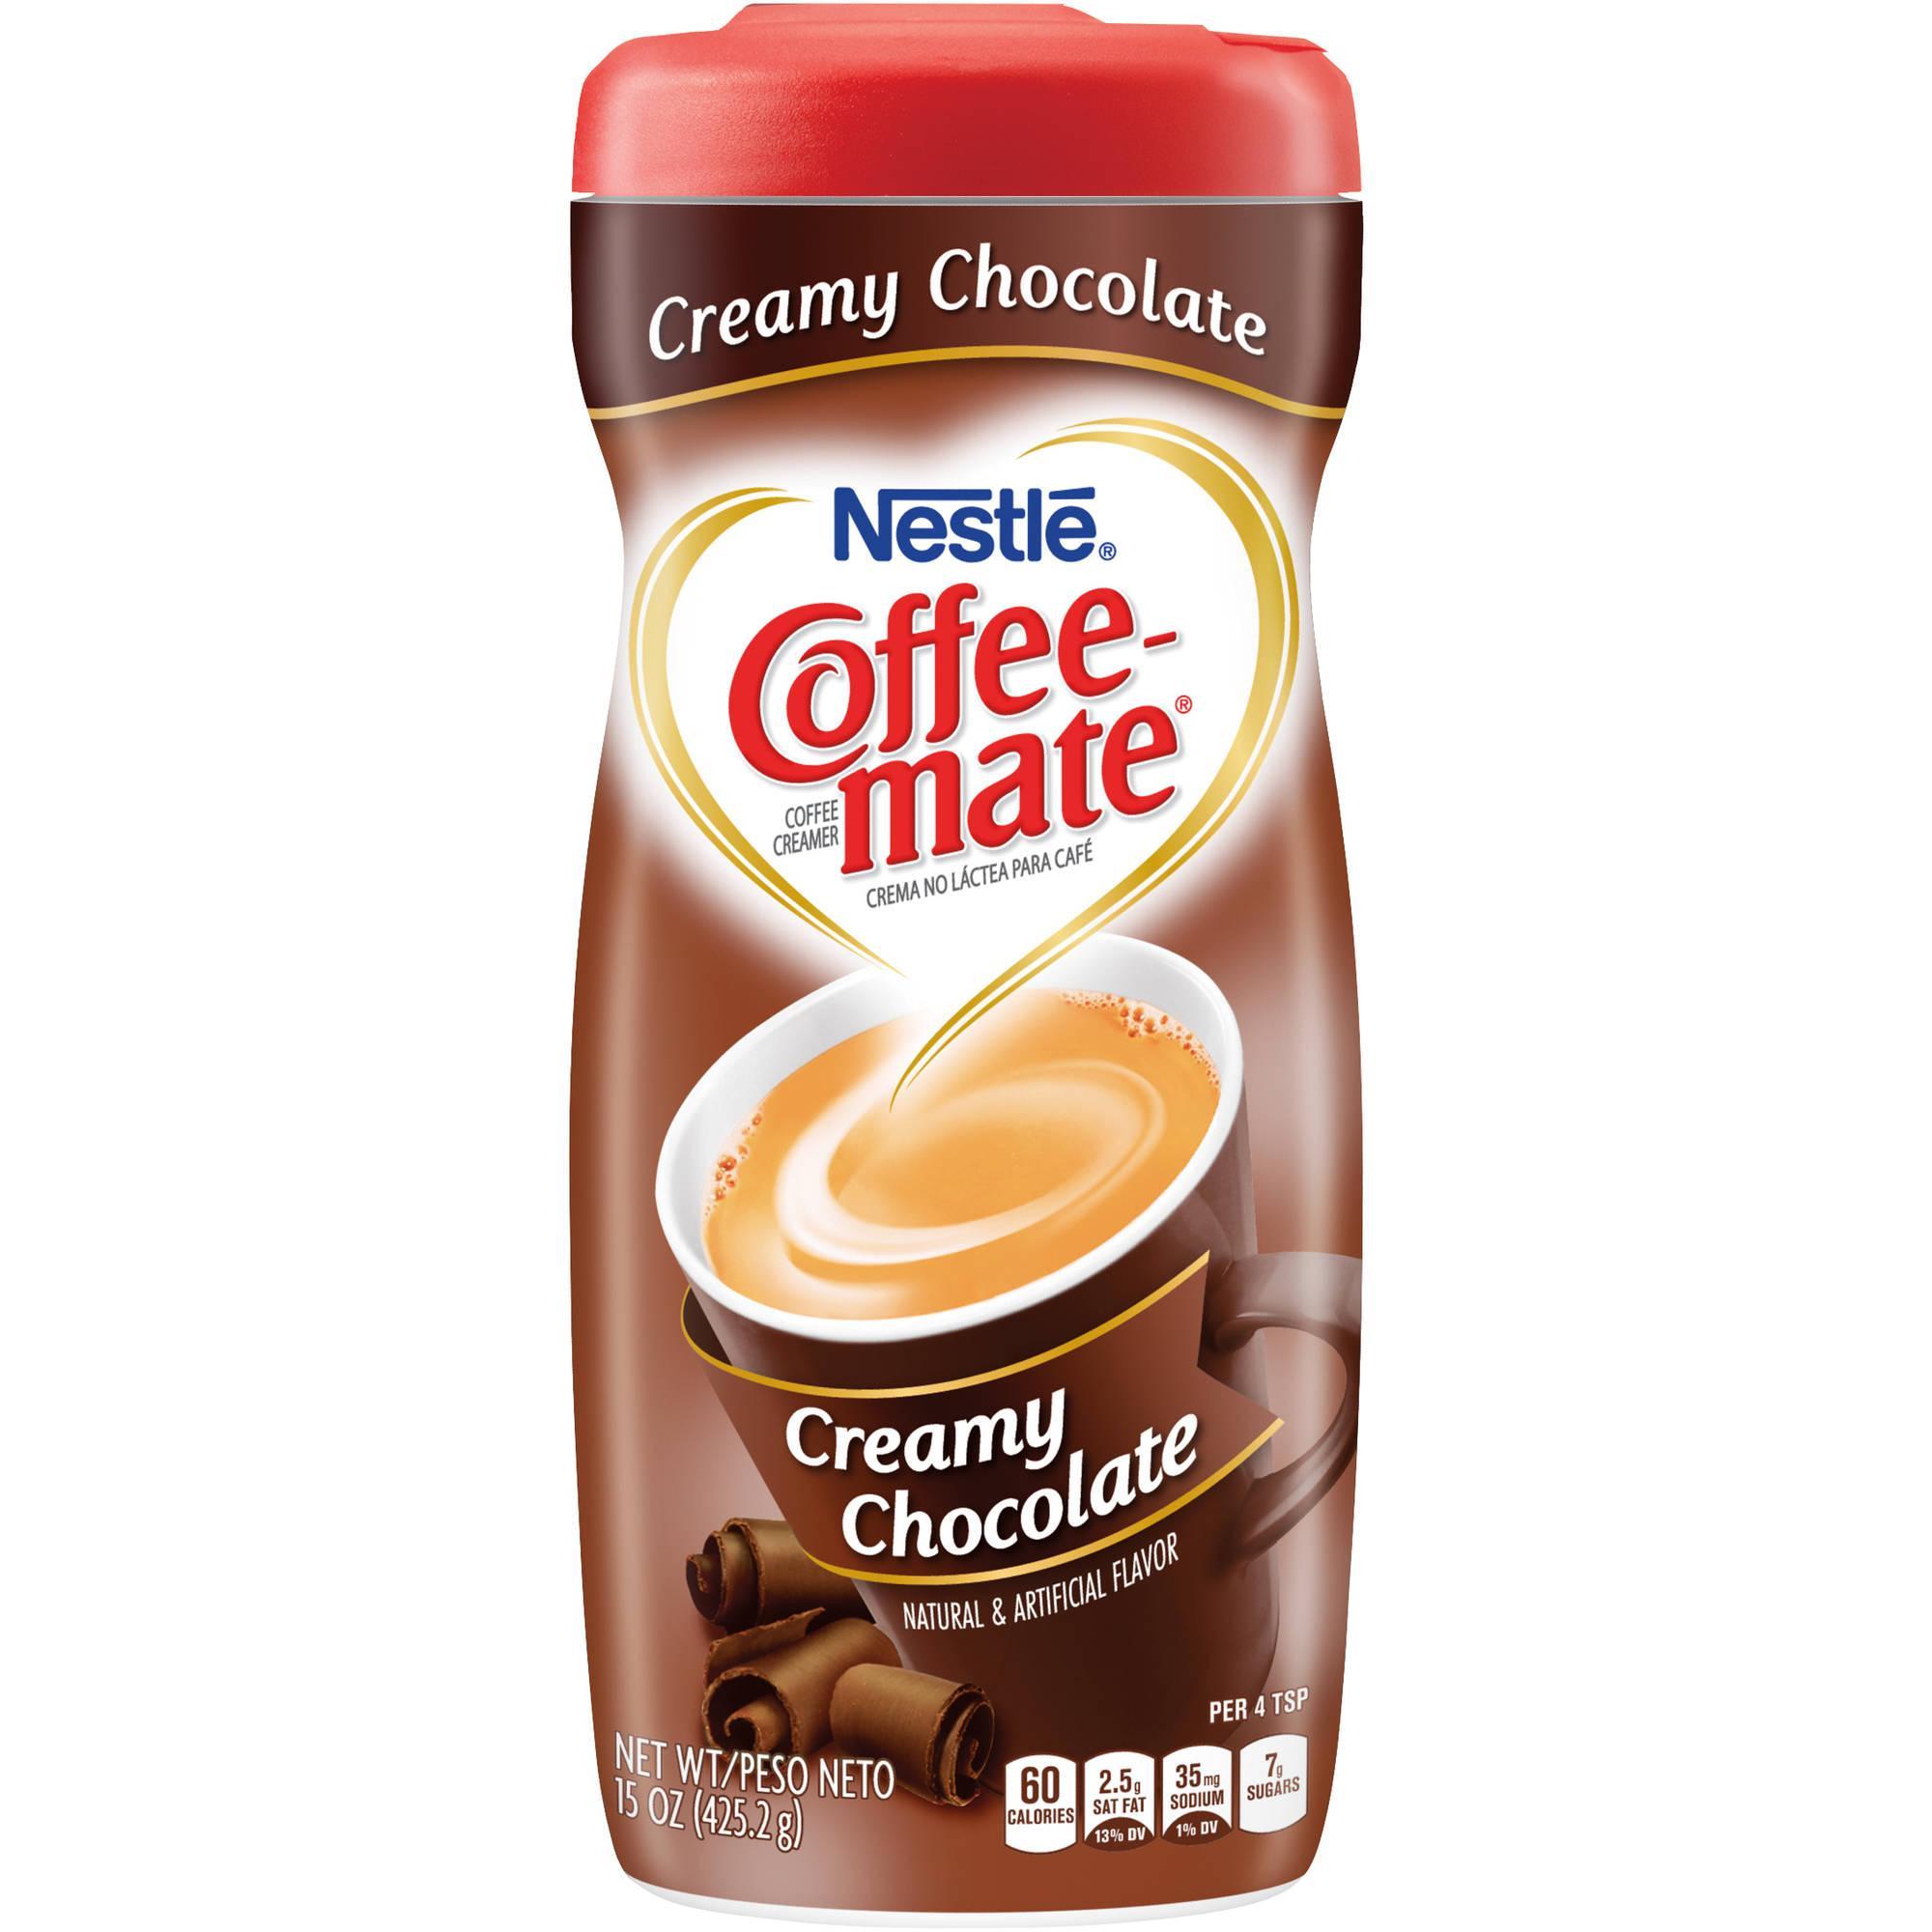 Coffee mate creamer coupon insert